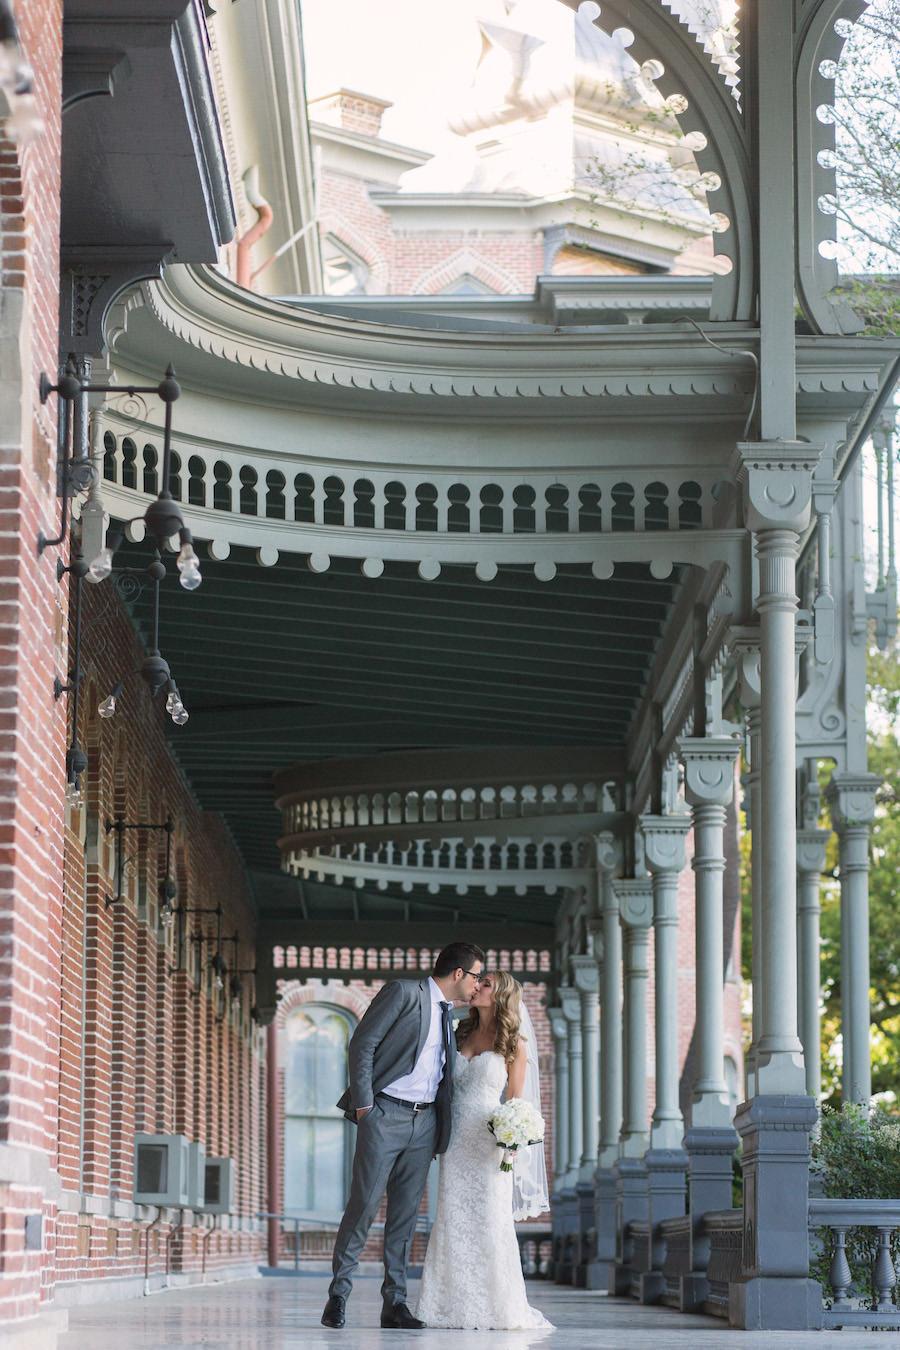 Outdoor Bride and Groom Wedding Portrait Kissing   University of Tampa Wedding Location